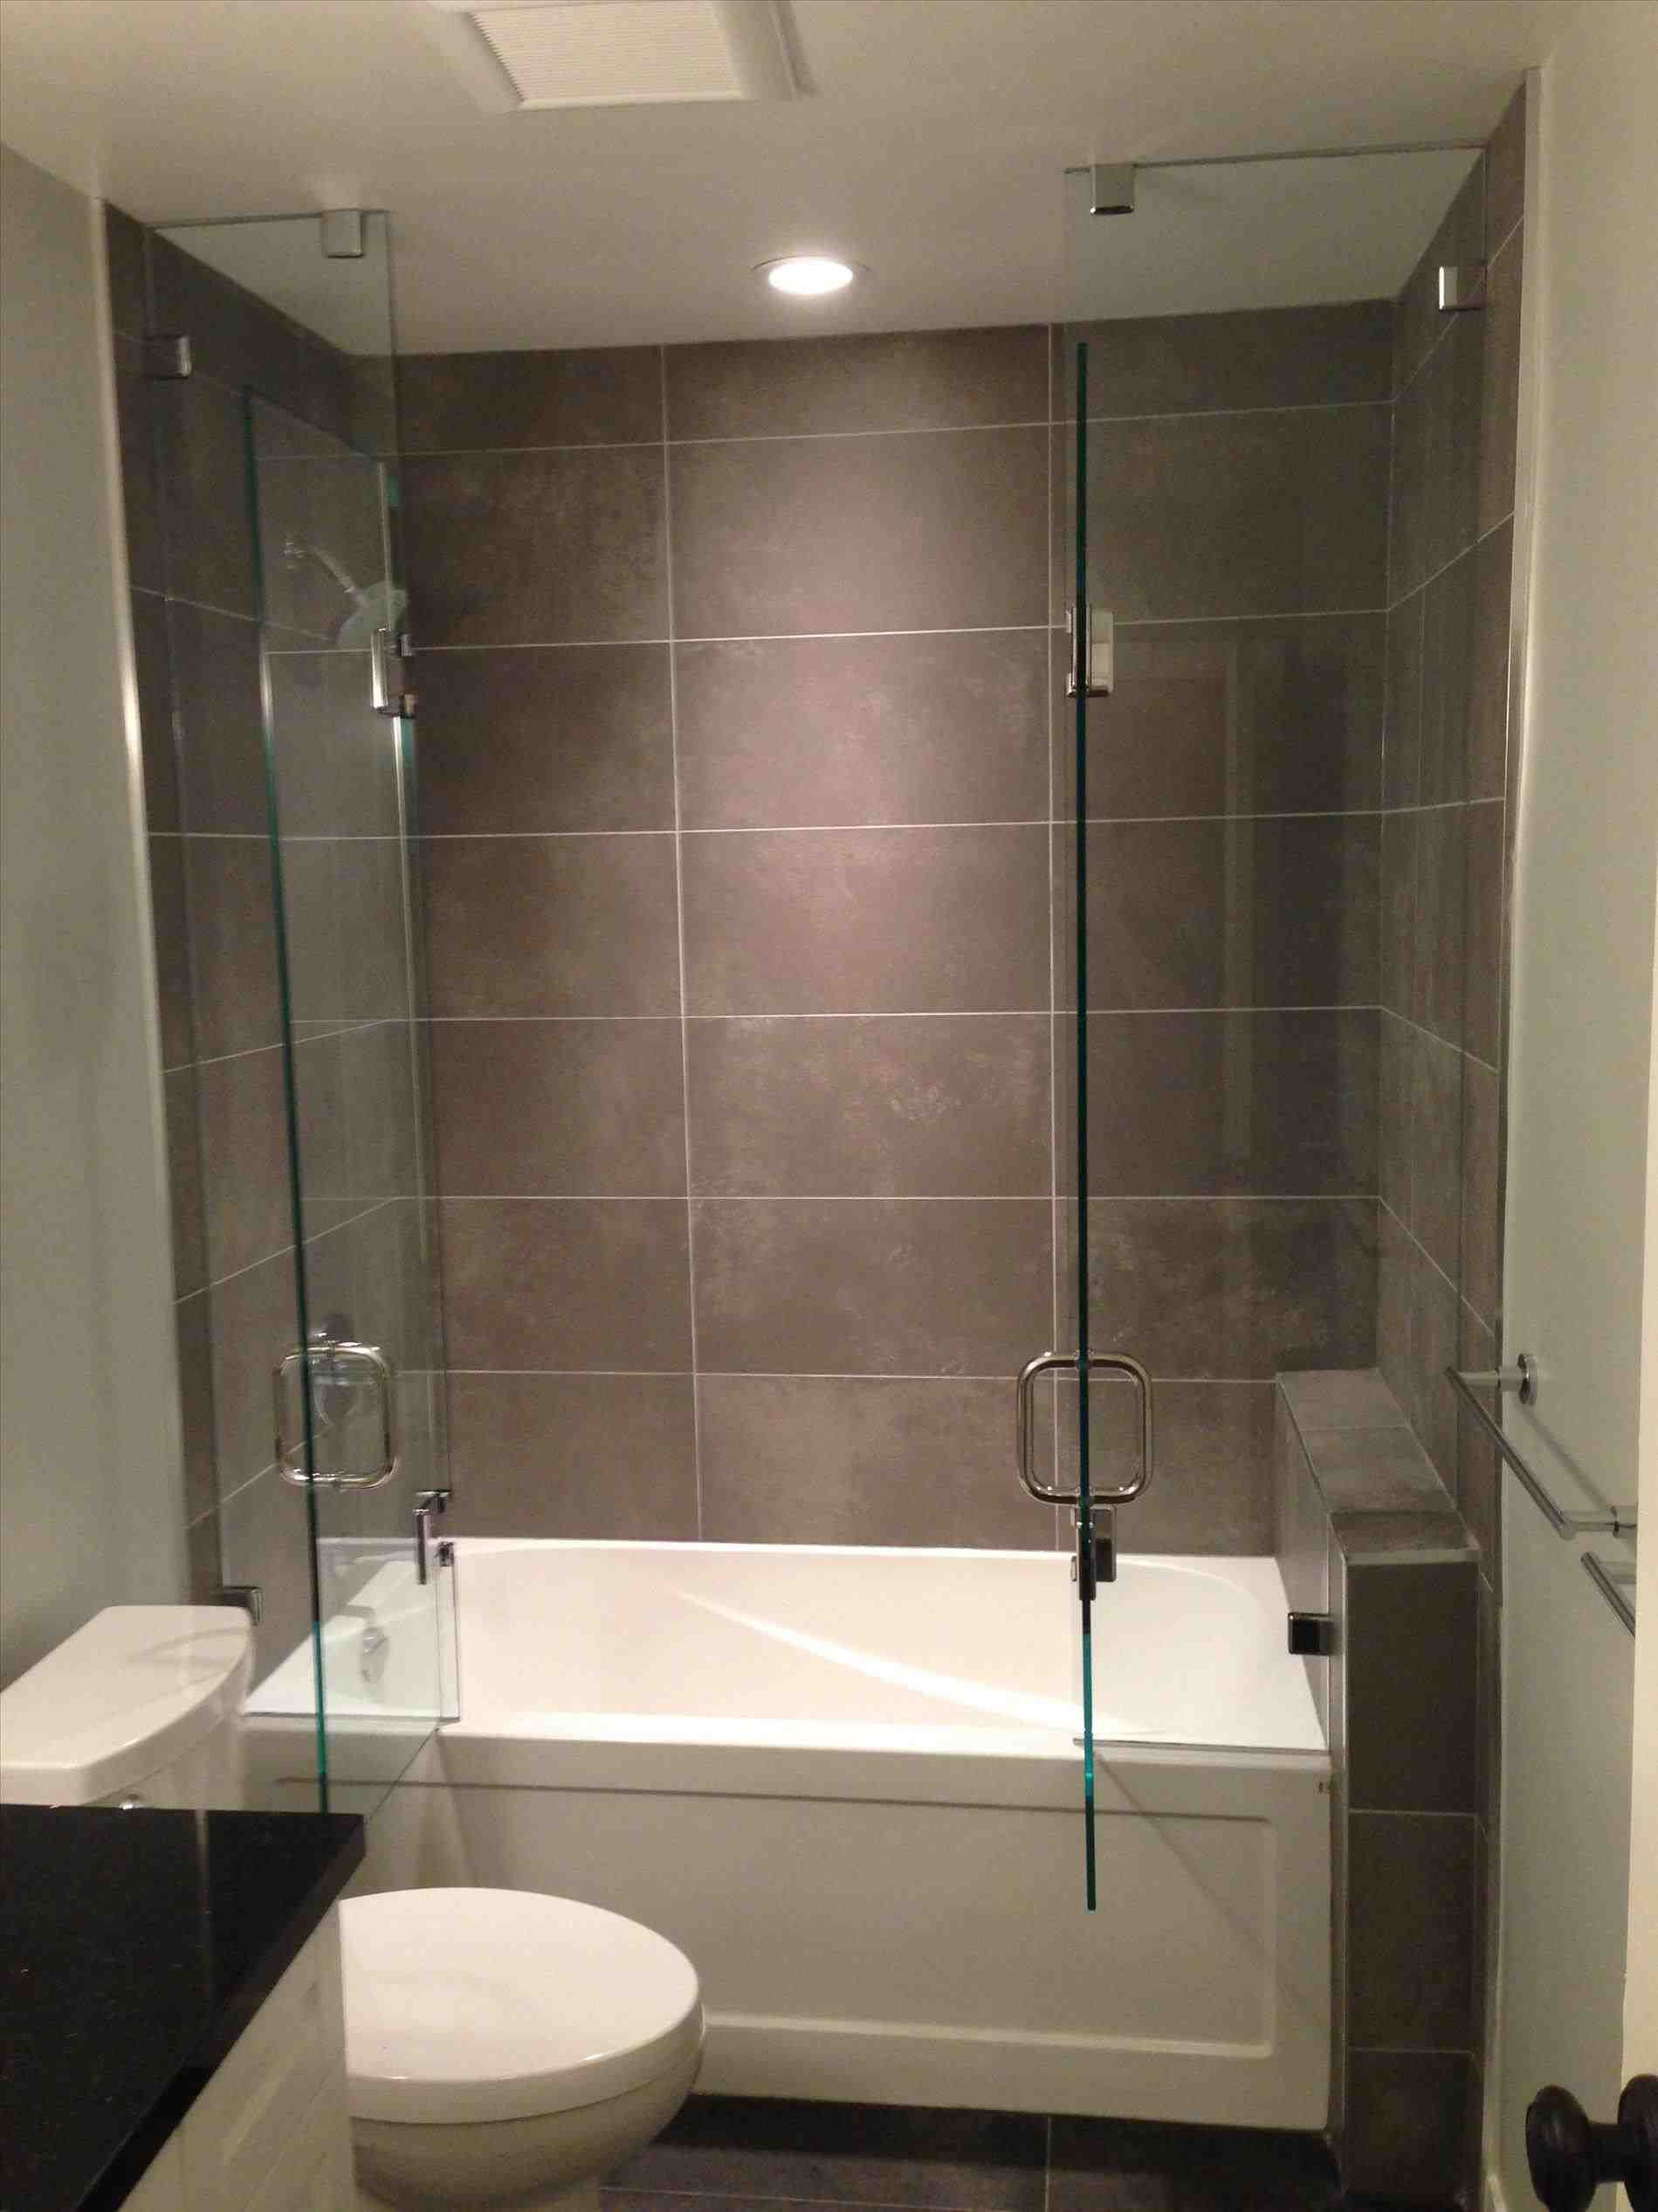 This Corner Jacuzzi Tub With Shower Ariel Bath 59 X 59 Corner Whirlpool Tub Bathtubs Plus In Home Depot Bathroom Home Depot Bathroom Tile Chic Bathroom Decor